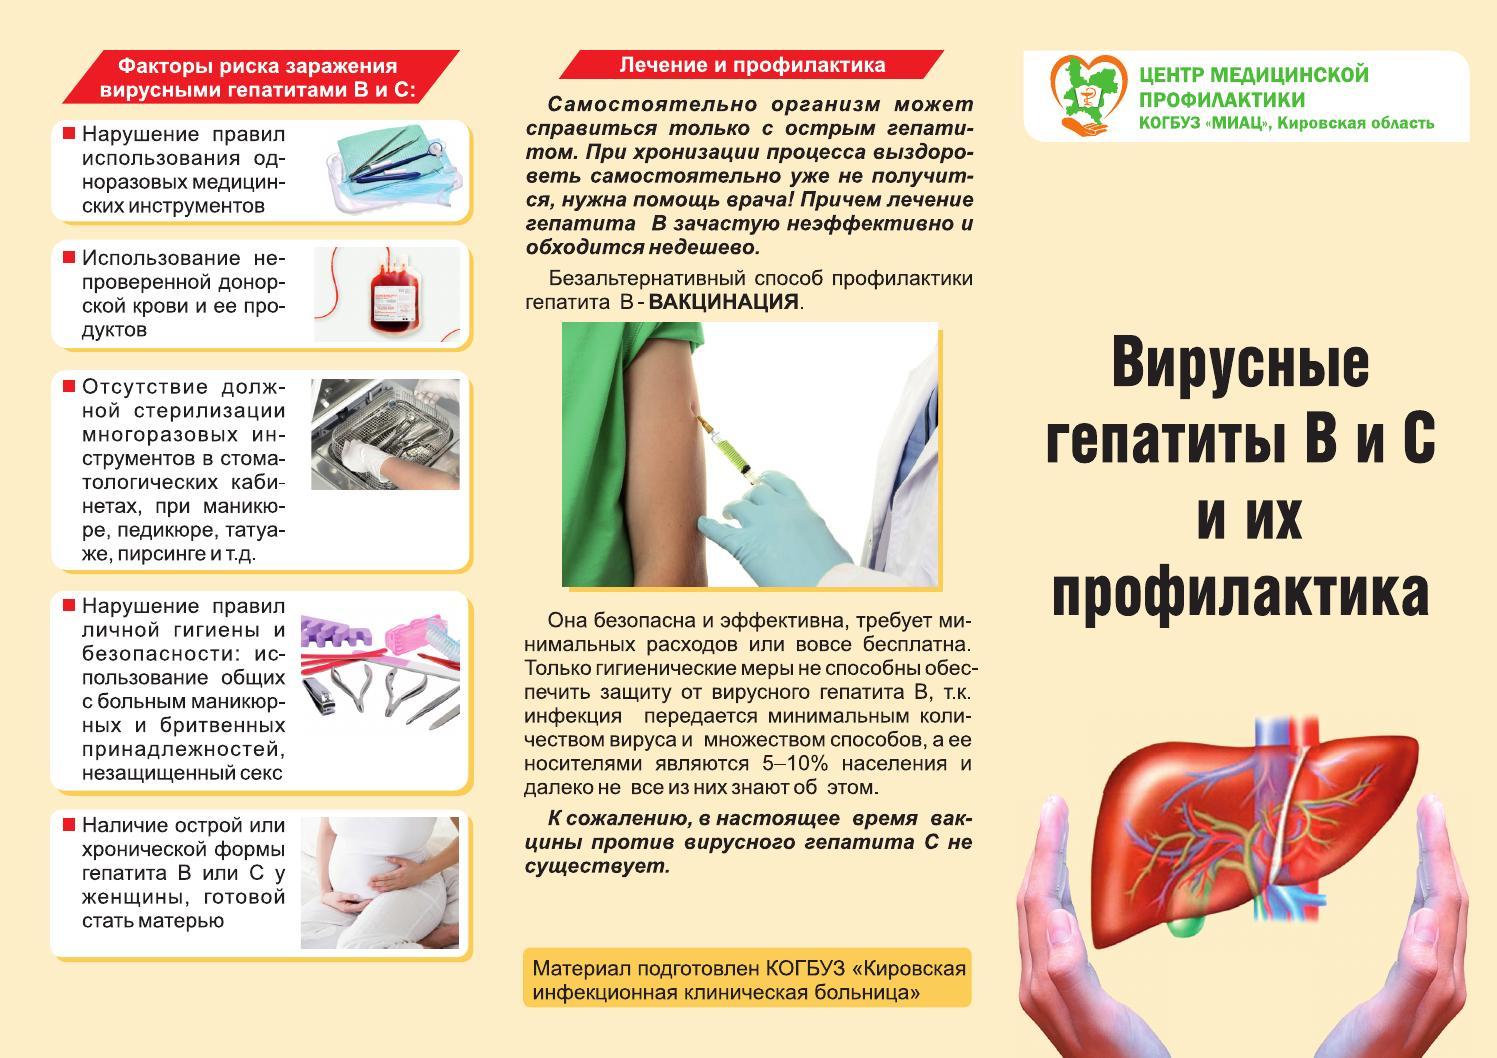 Памятка гепатит а картинки